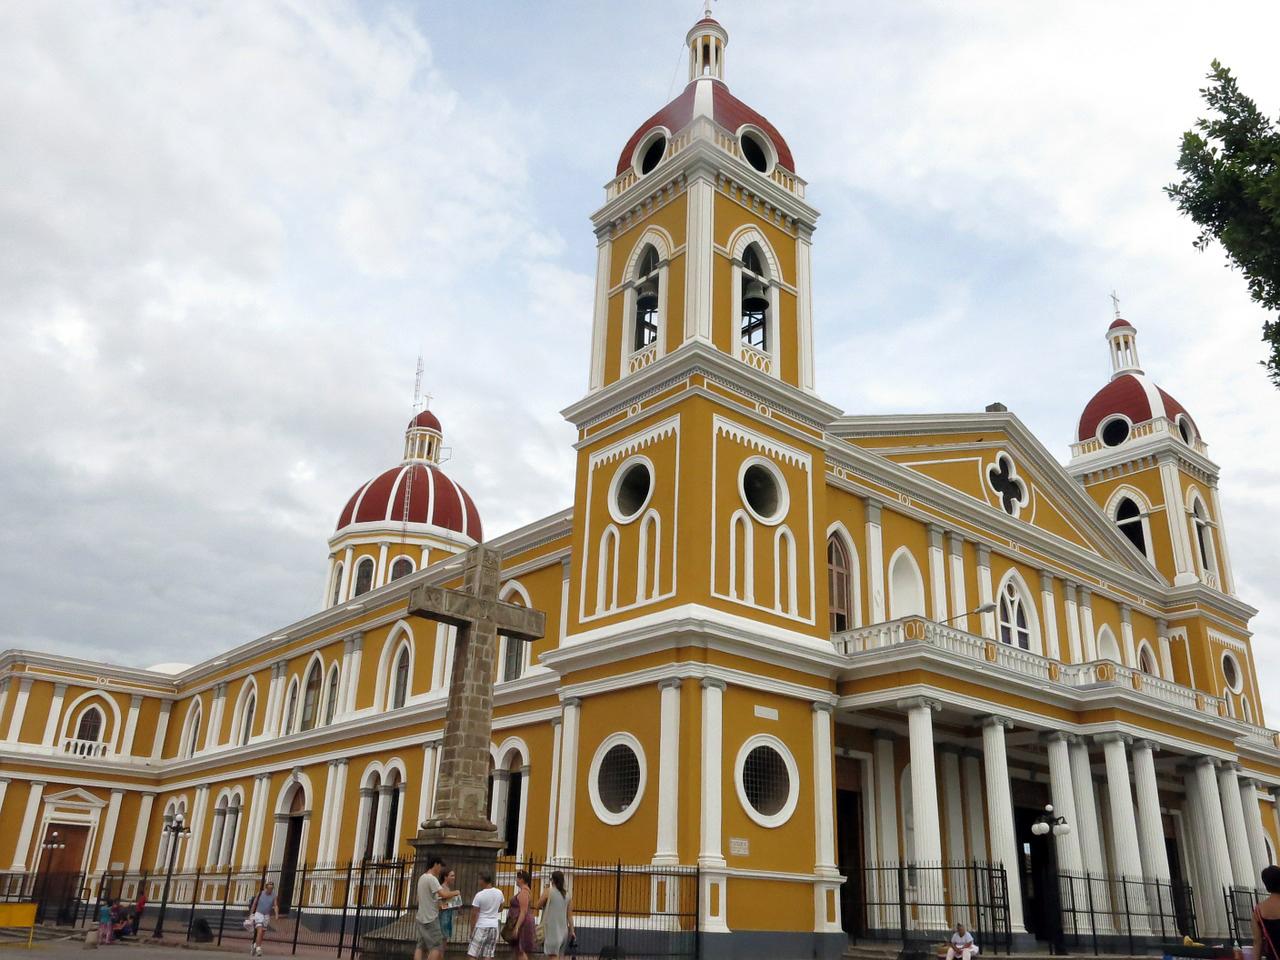 church-402750_1280.jpg